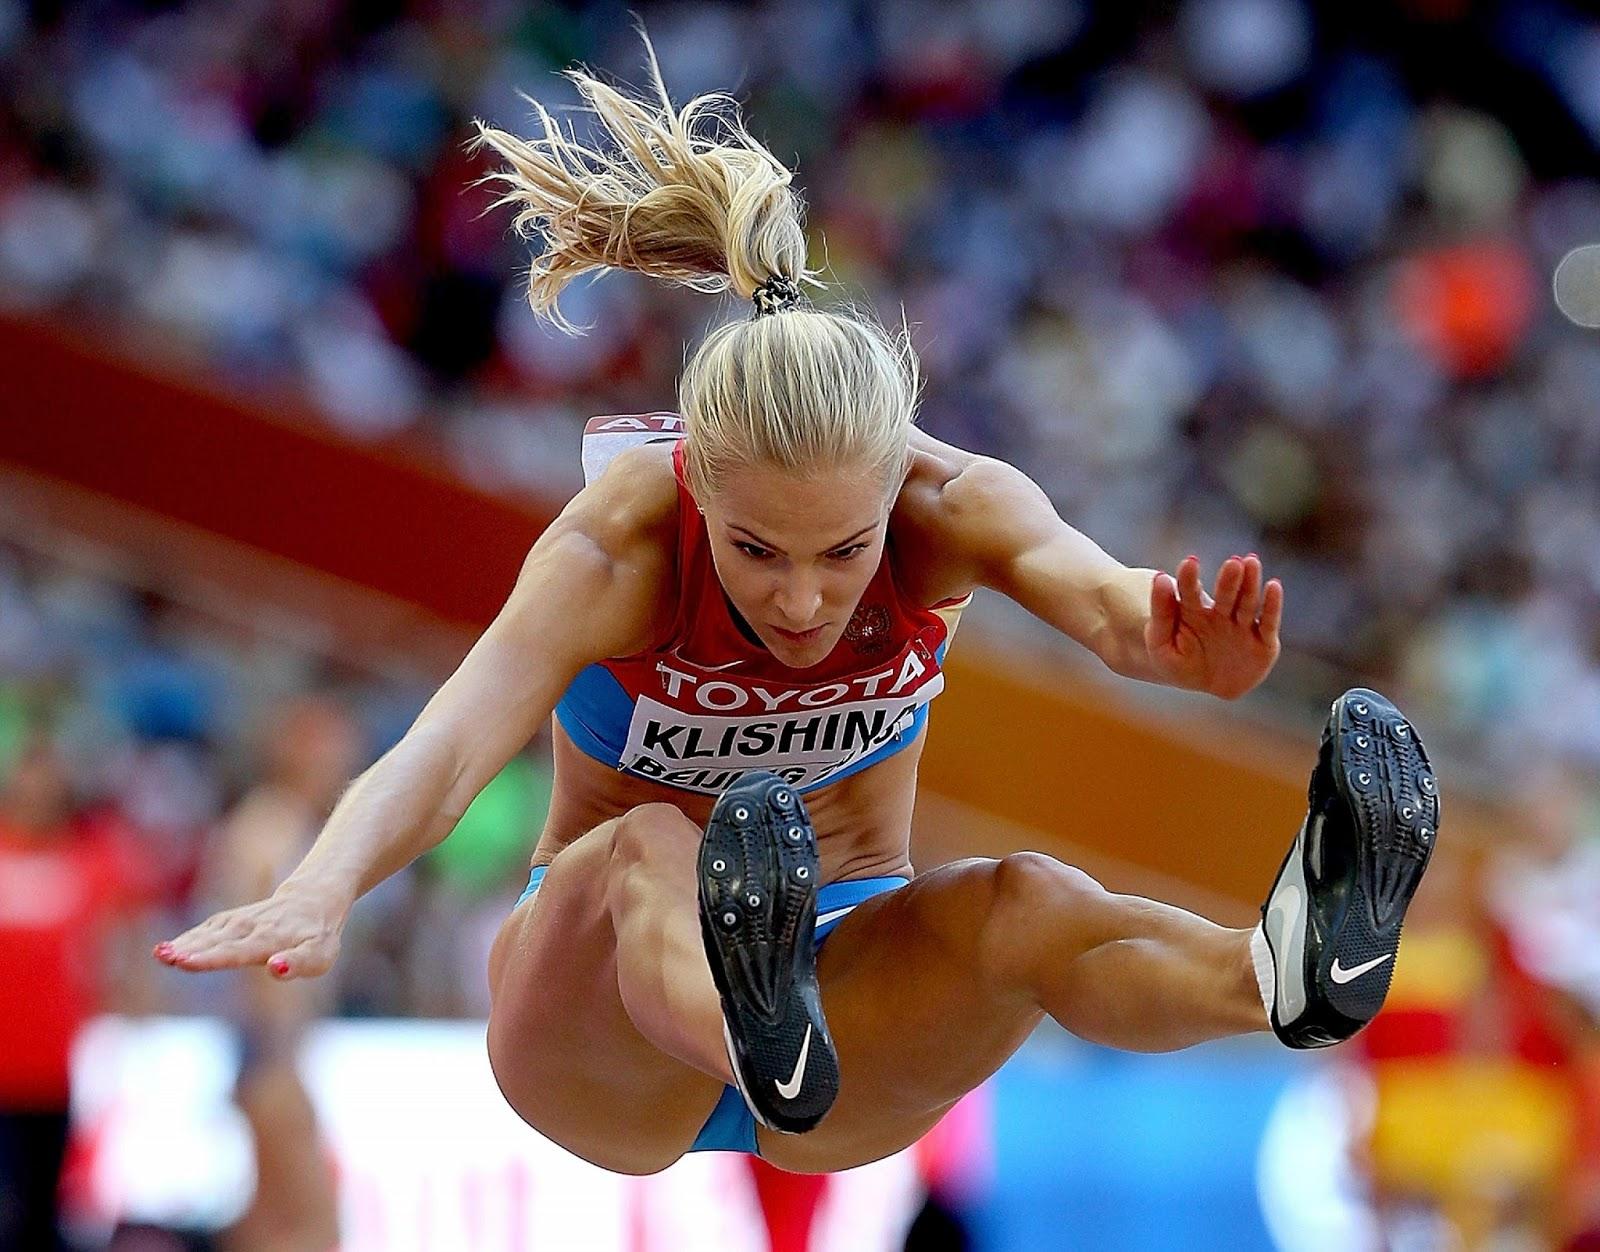 RUSSIA 2016 RIO OLYMPICS 5